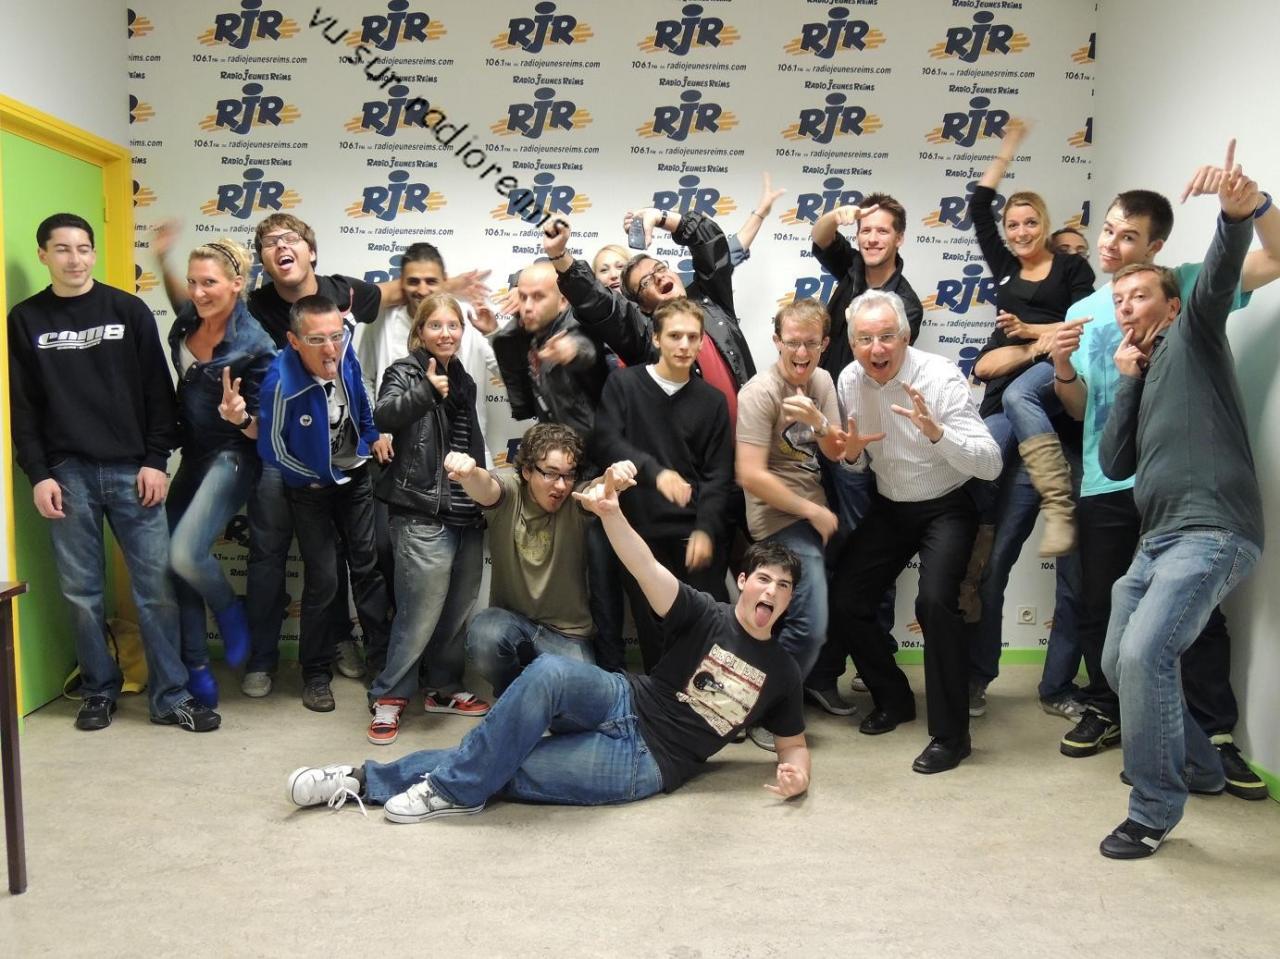 Equipe RJR 2012 2013